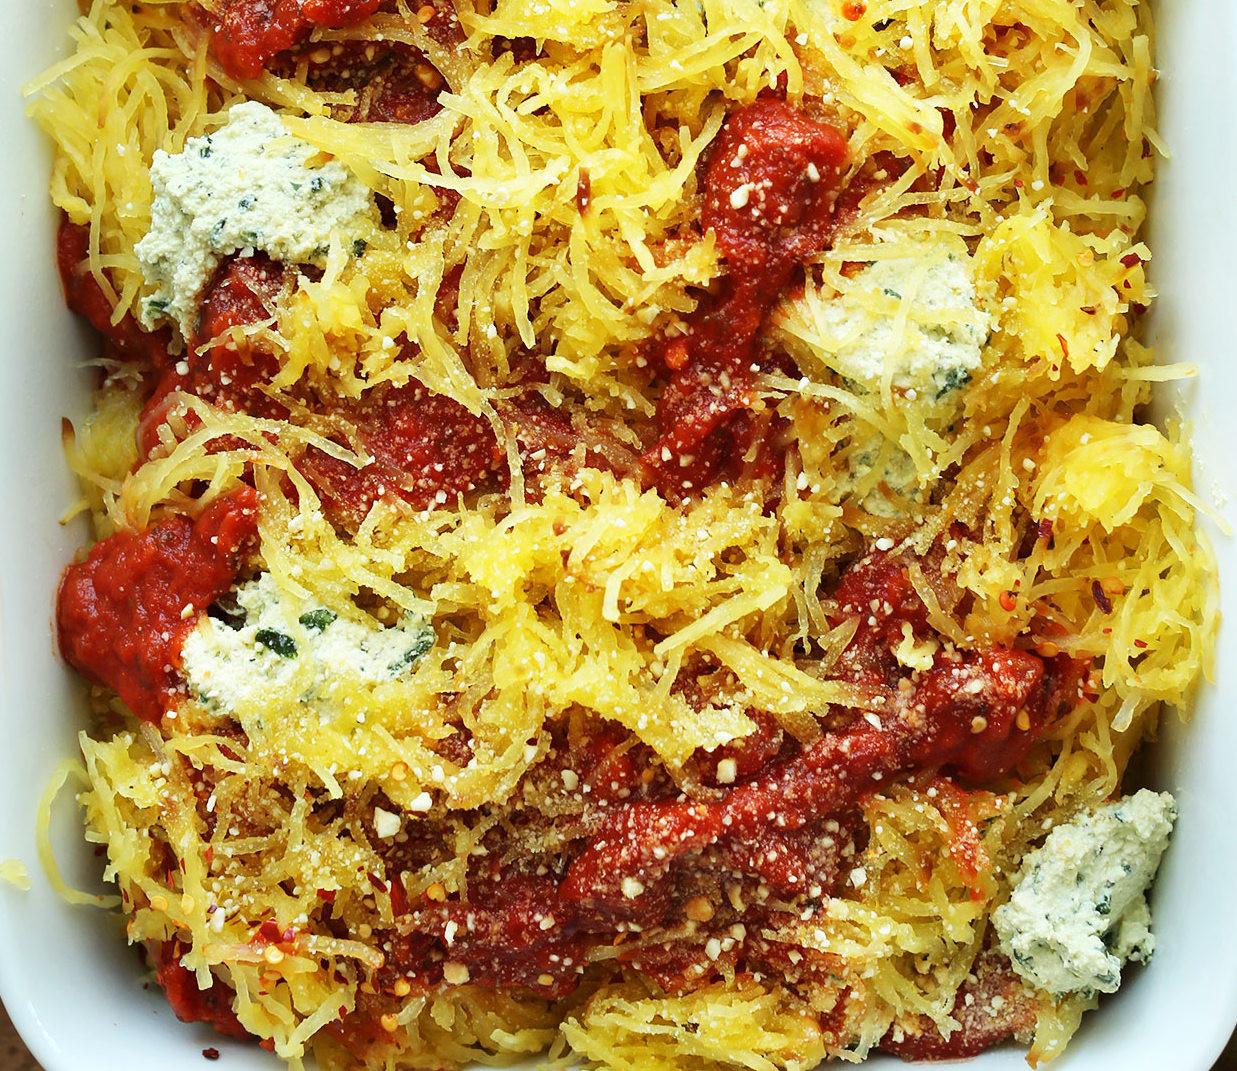 Spaghetti Squash Healthy  recipe – You Bet Your Pierogi